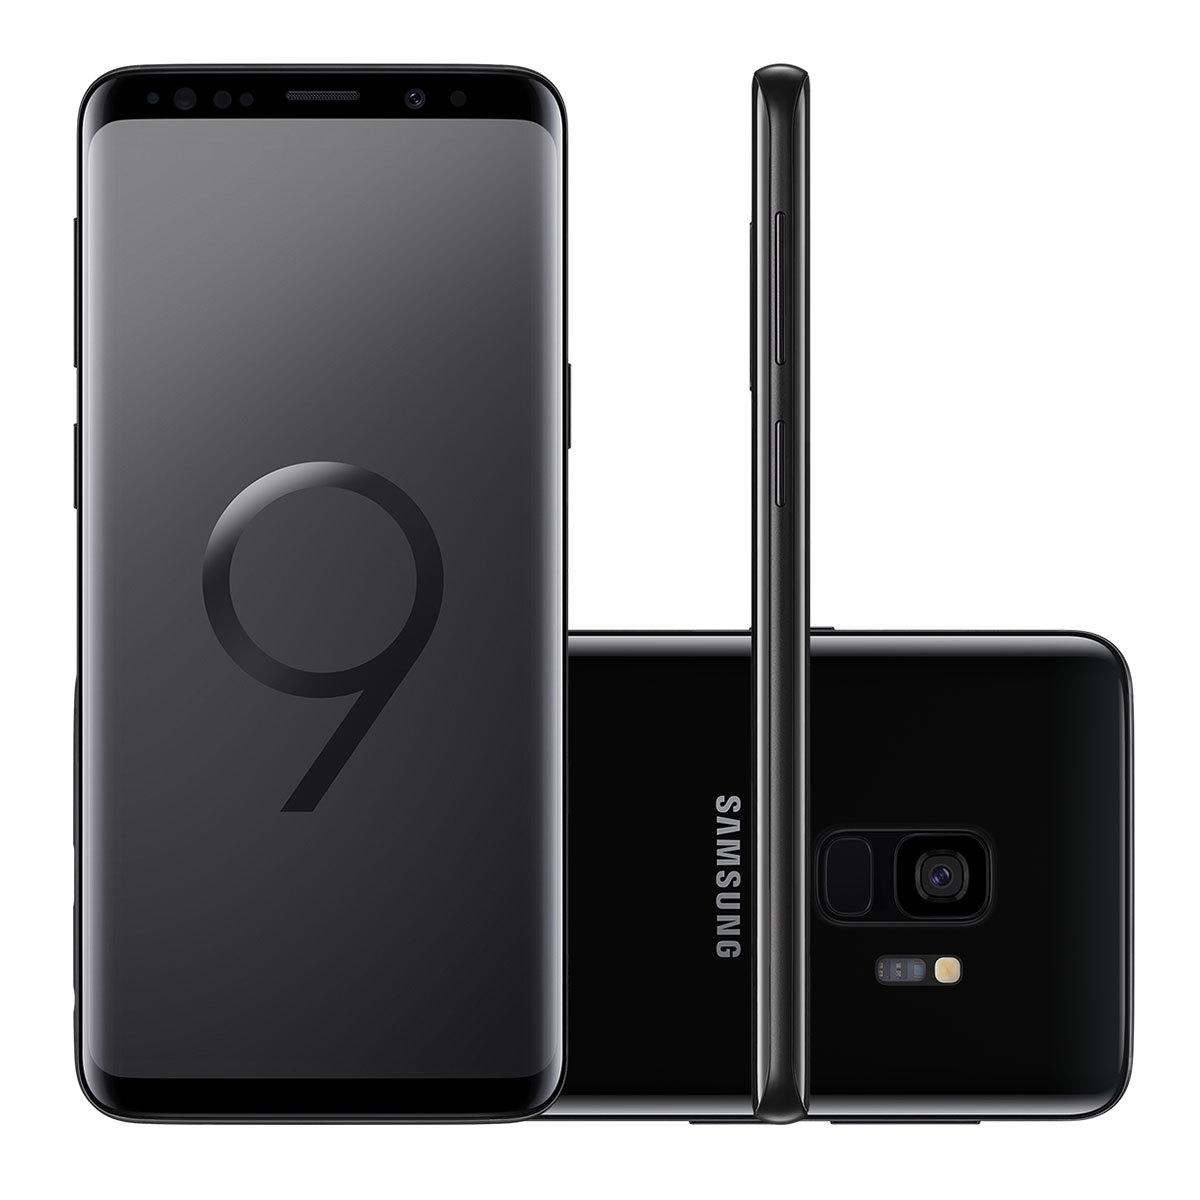 "Smartphone Samsung Galaxy S9 128GB Preto Tela 5.8"" Câmera 12MP Android 8.0"